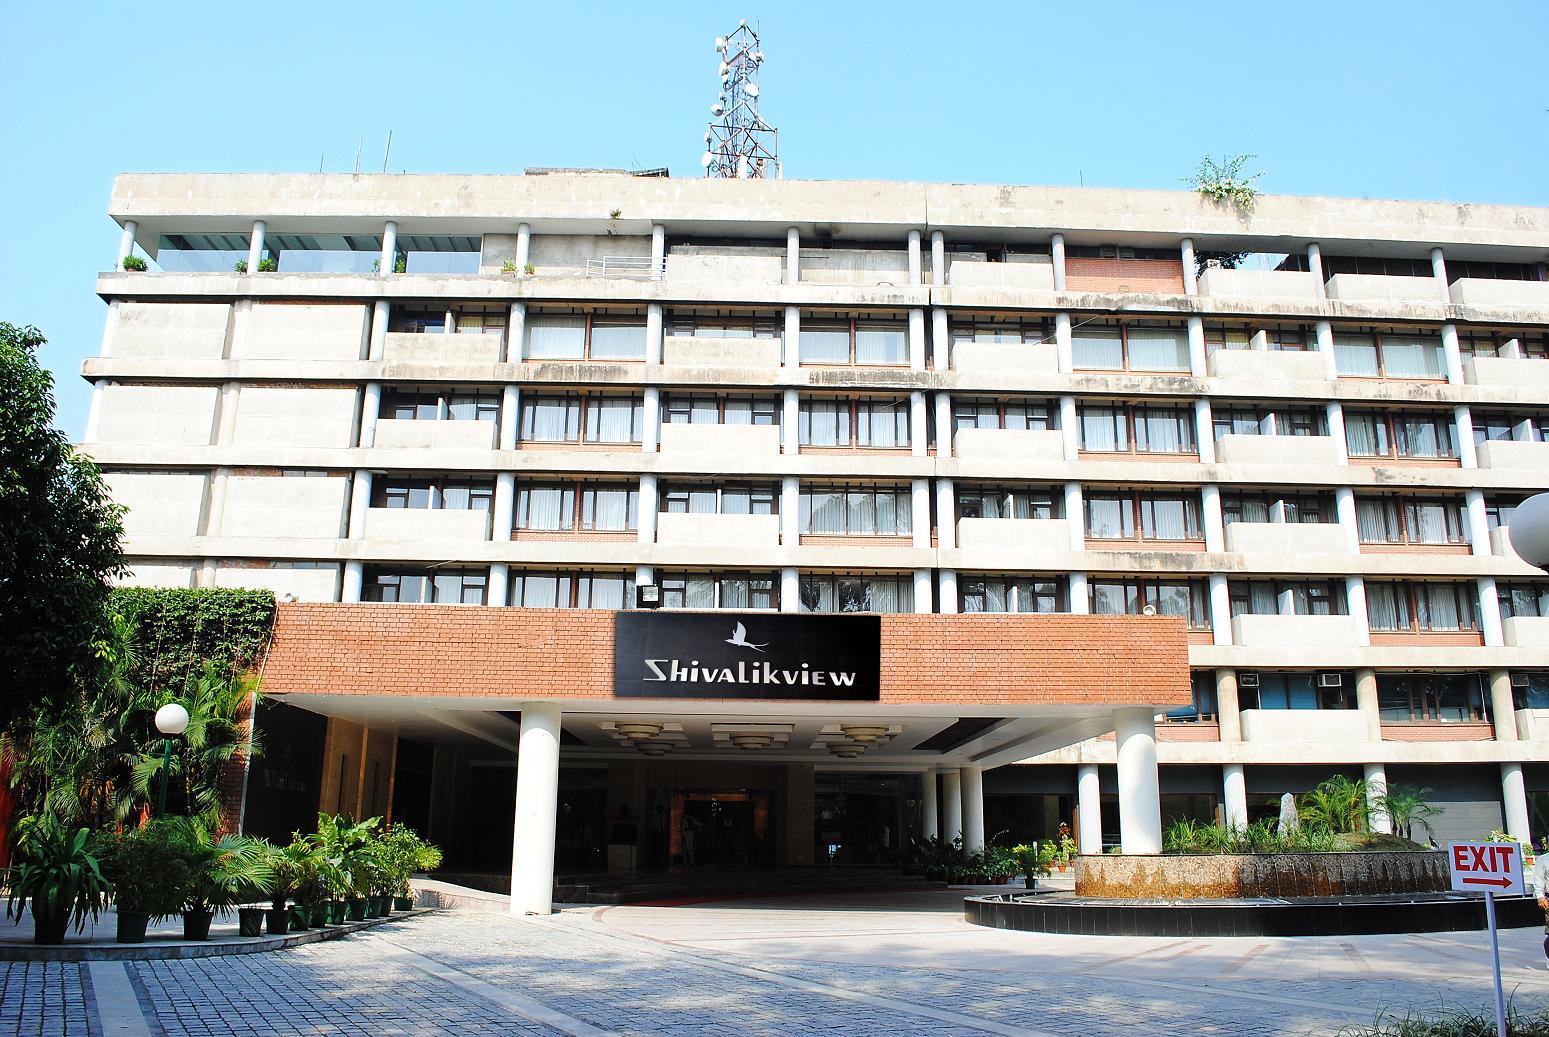 Shivalik View